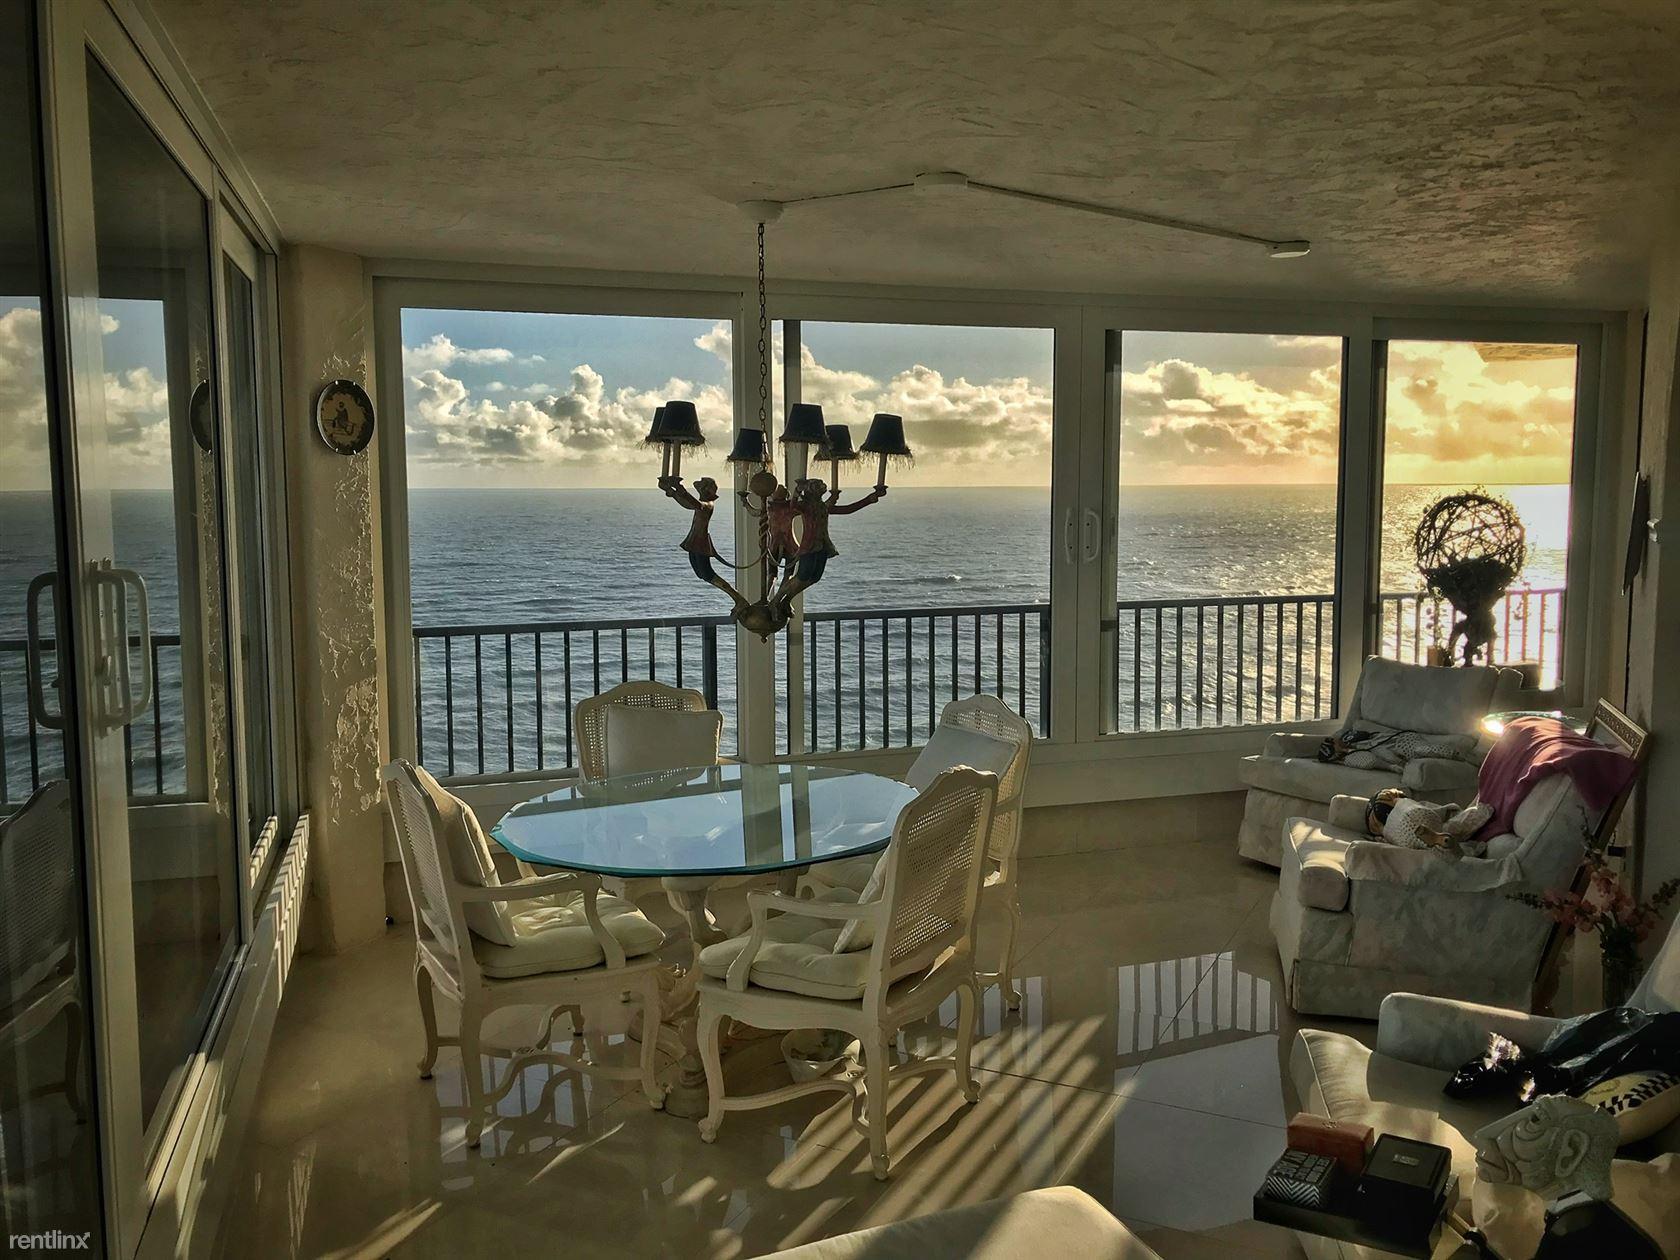 $7000 - $1250 per month , 2400 S Ocean Dr Apt 8100B, Ocean Village